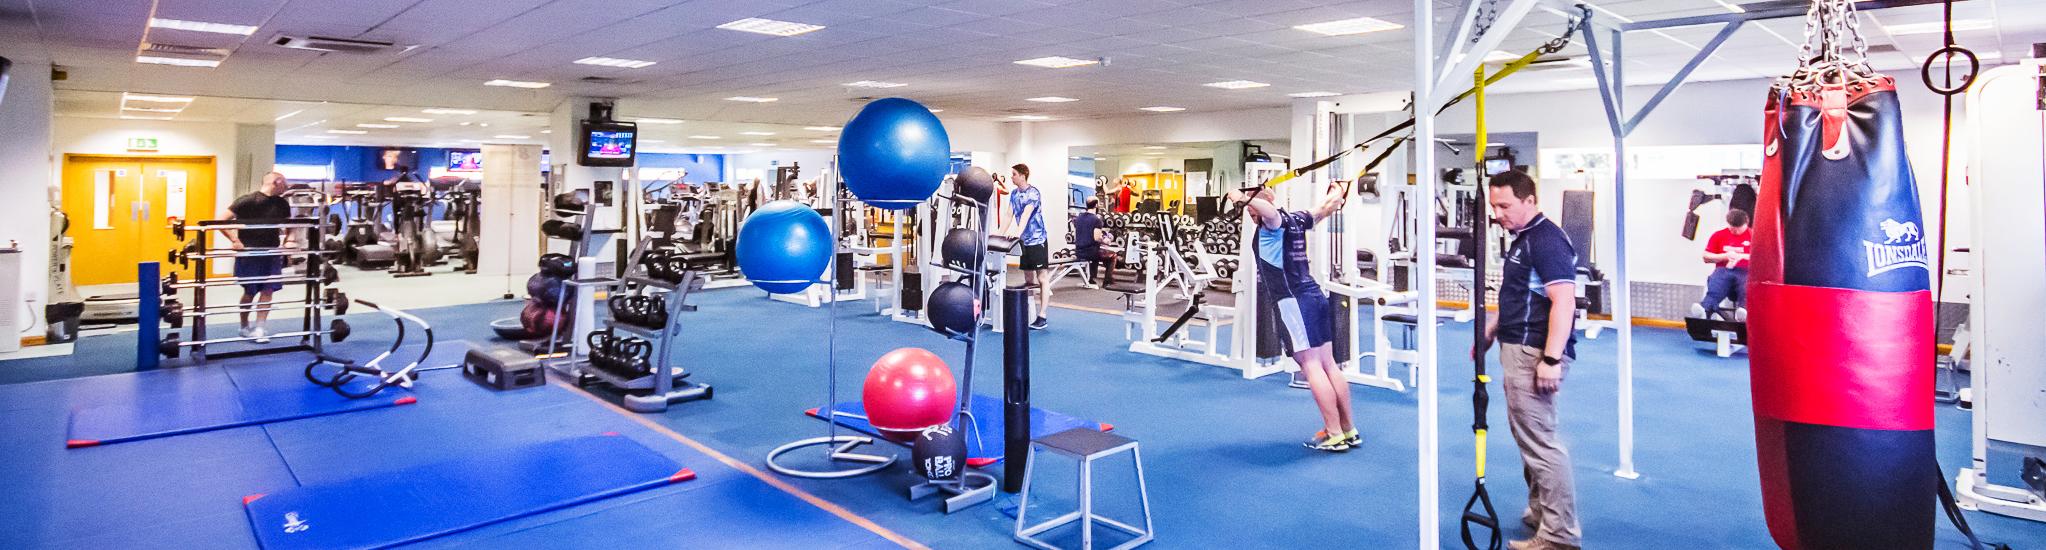 The Physio Clinic Bristol gym